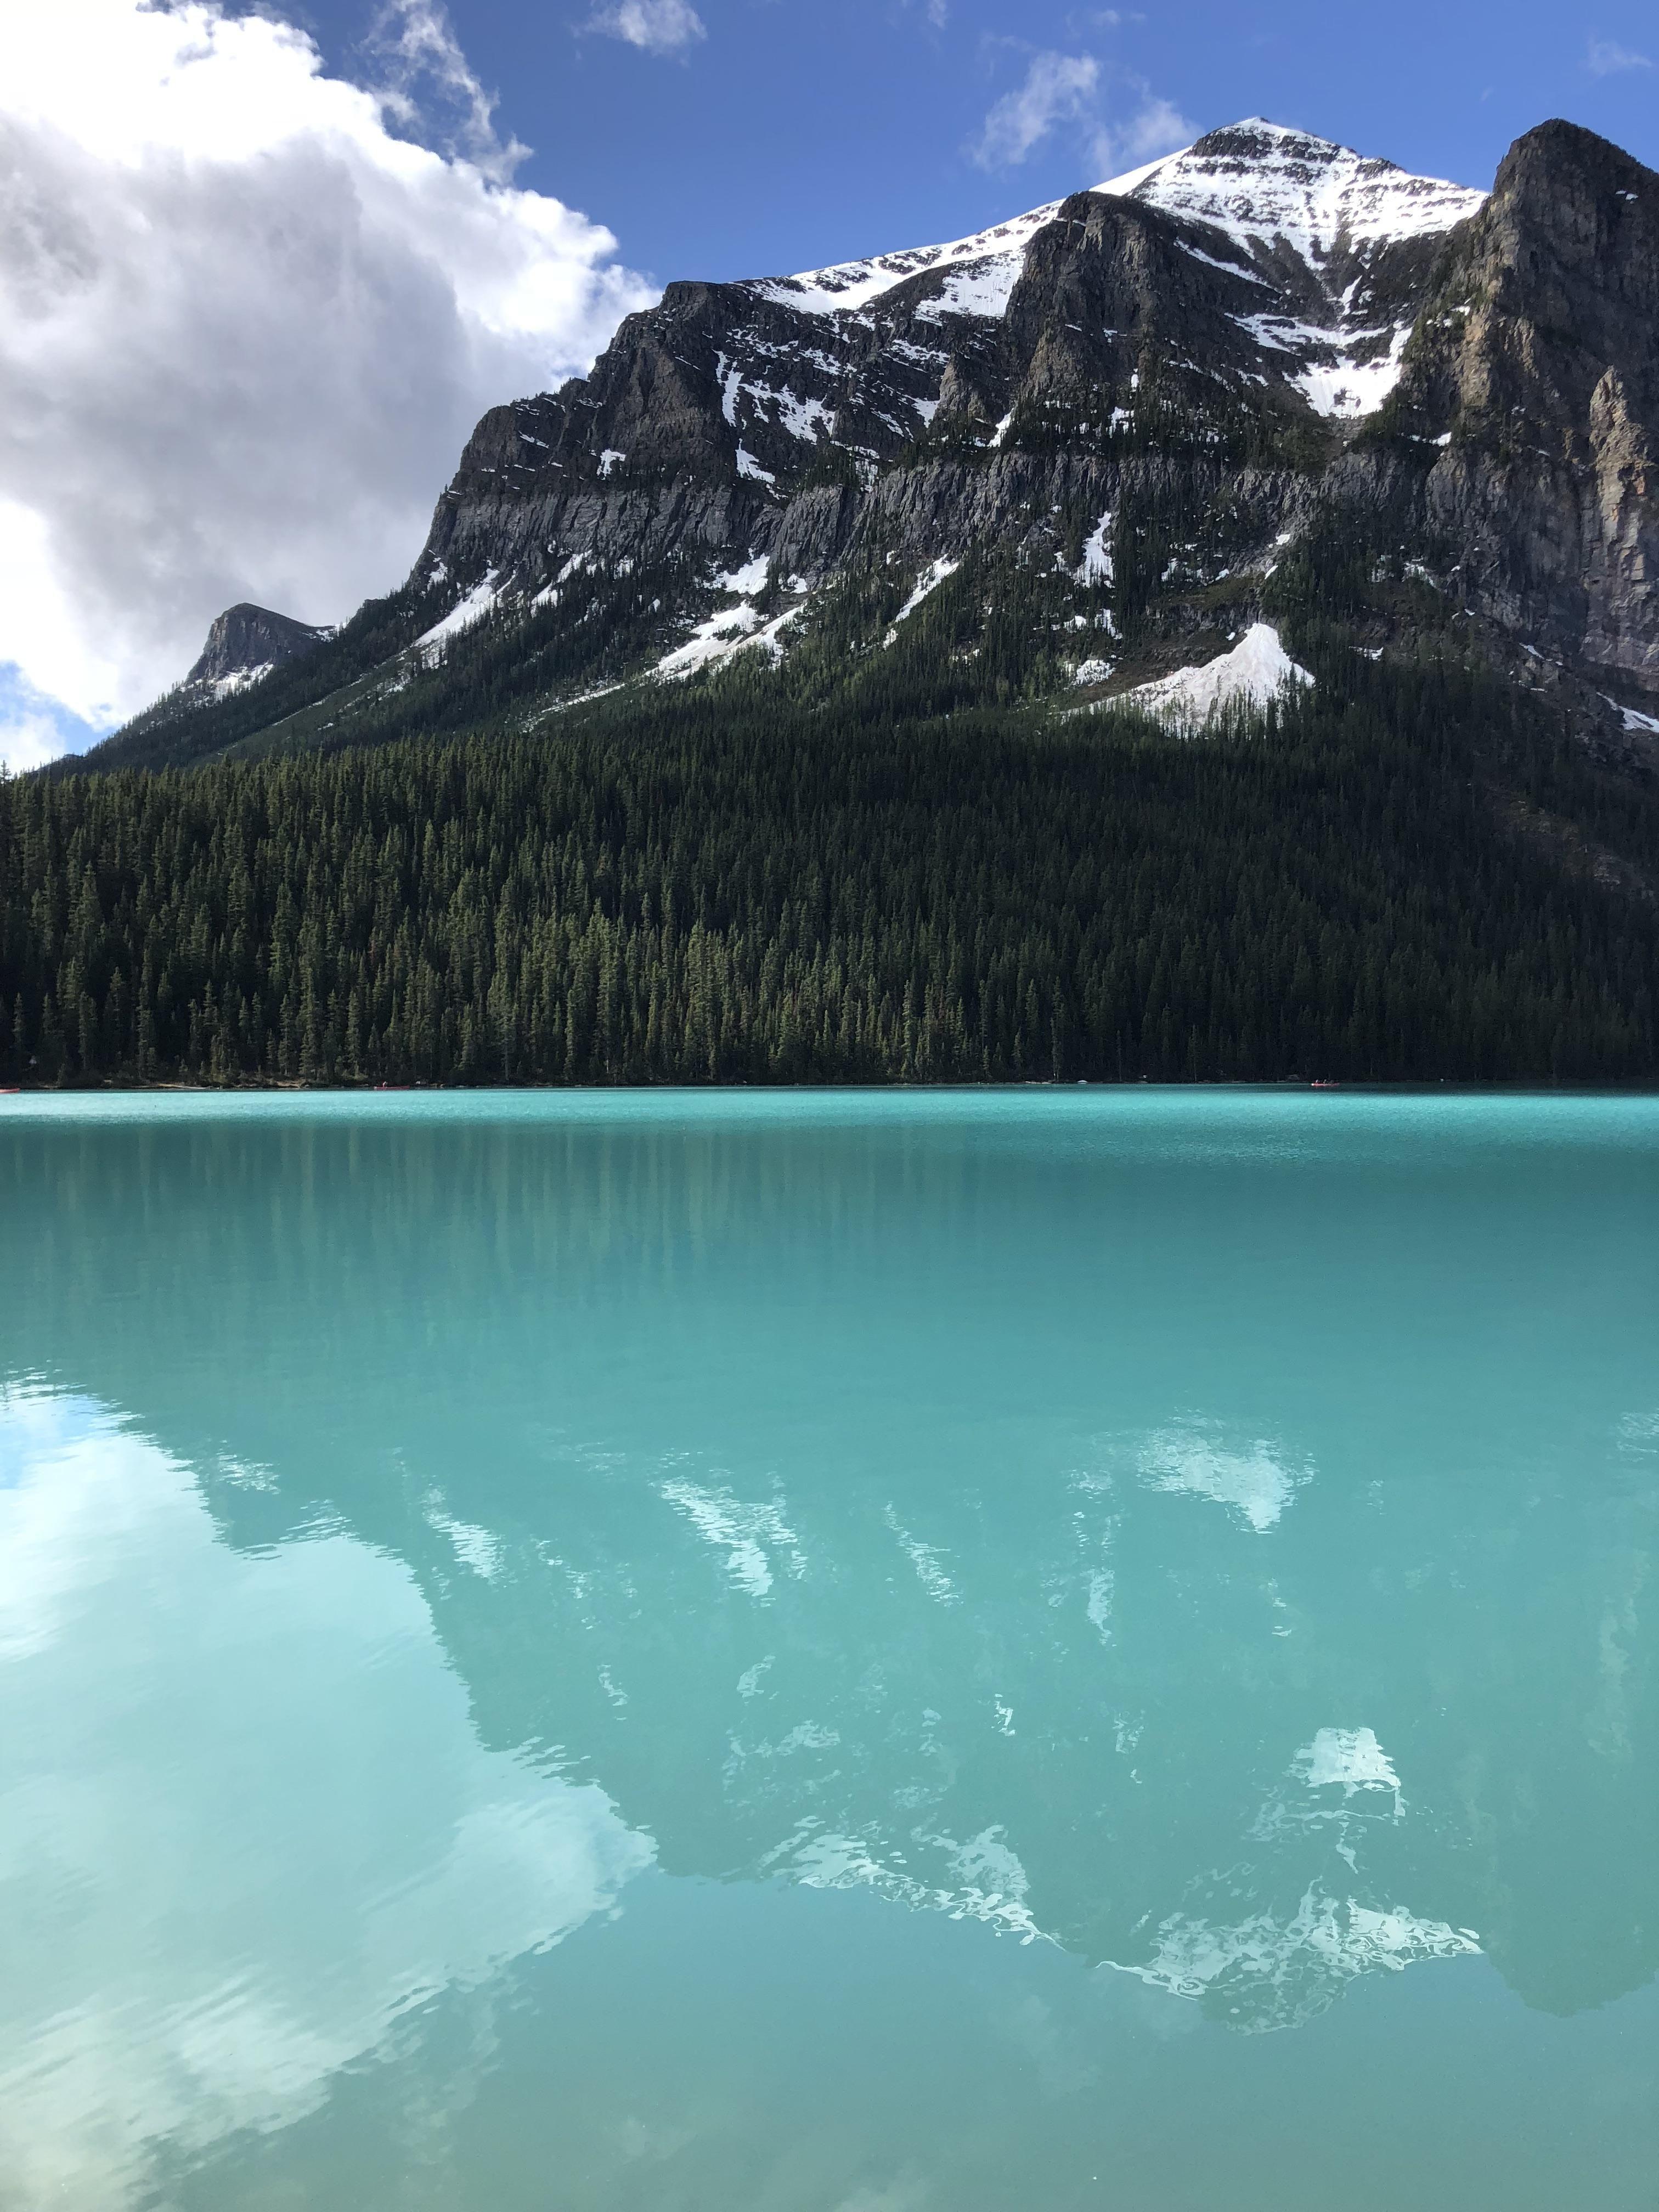 Lake louisebanff national park ca 3024 x 4032 nature